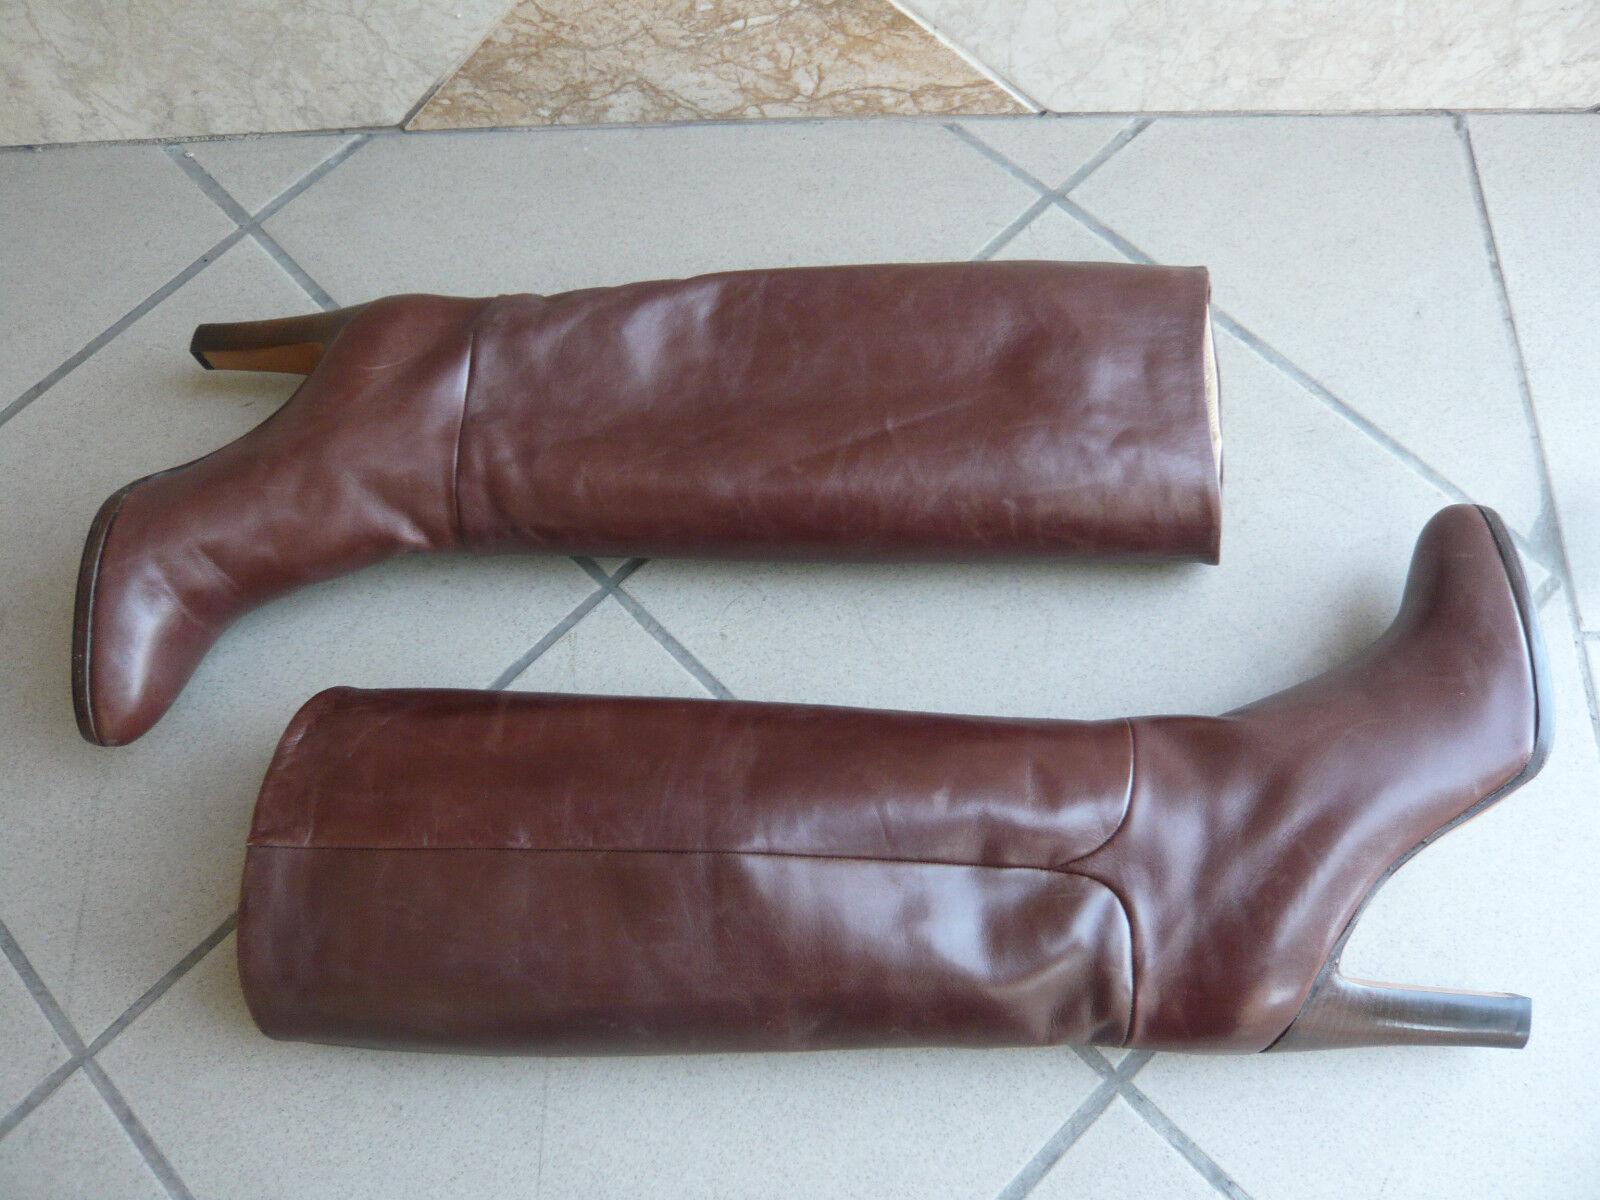 Stiefel vintage vintage vintage 1982  braun Gold  - MARMOLADA Italien t. 39  499568